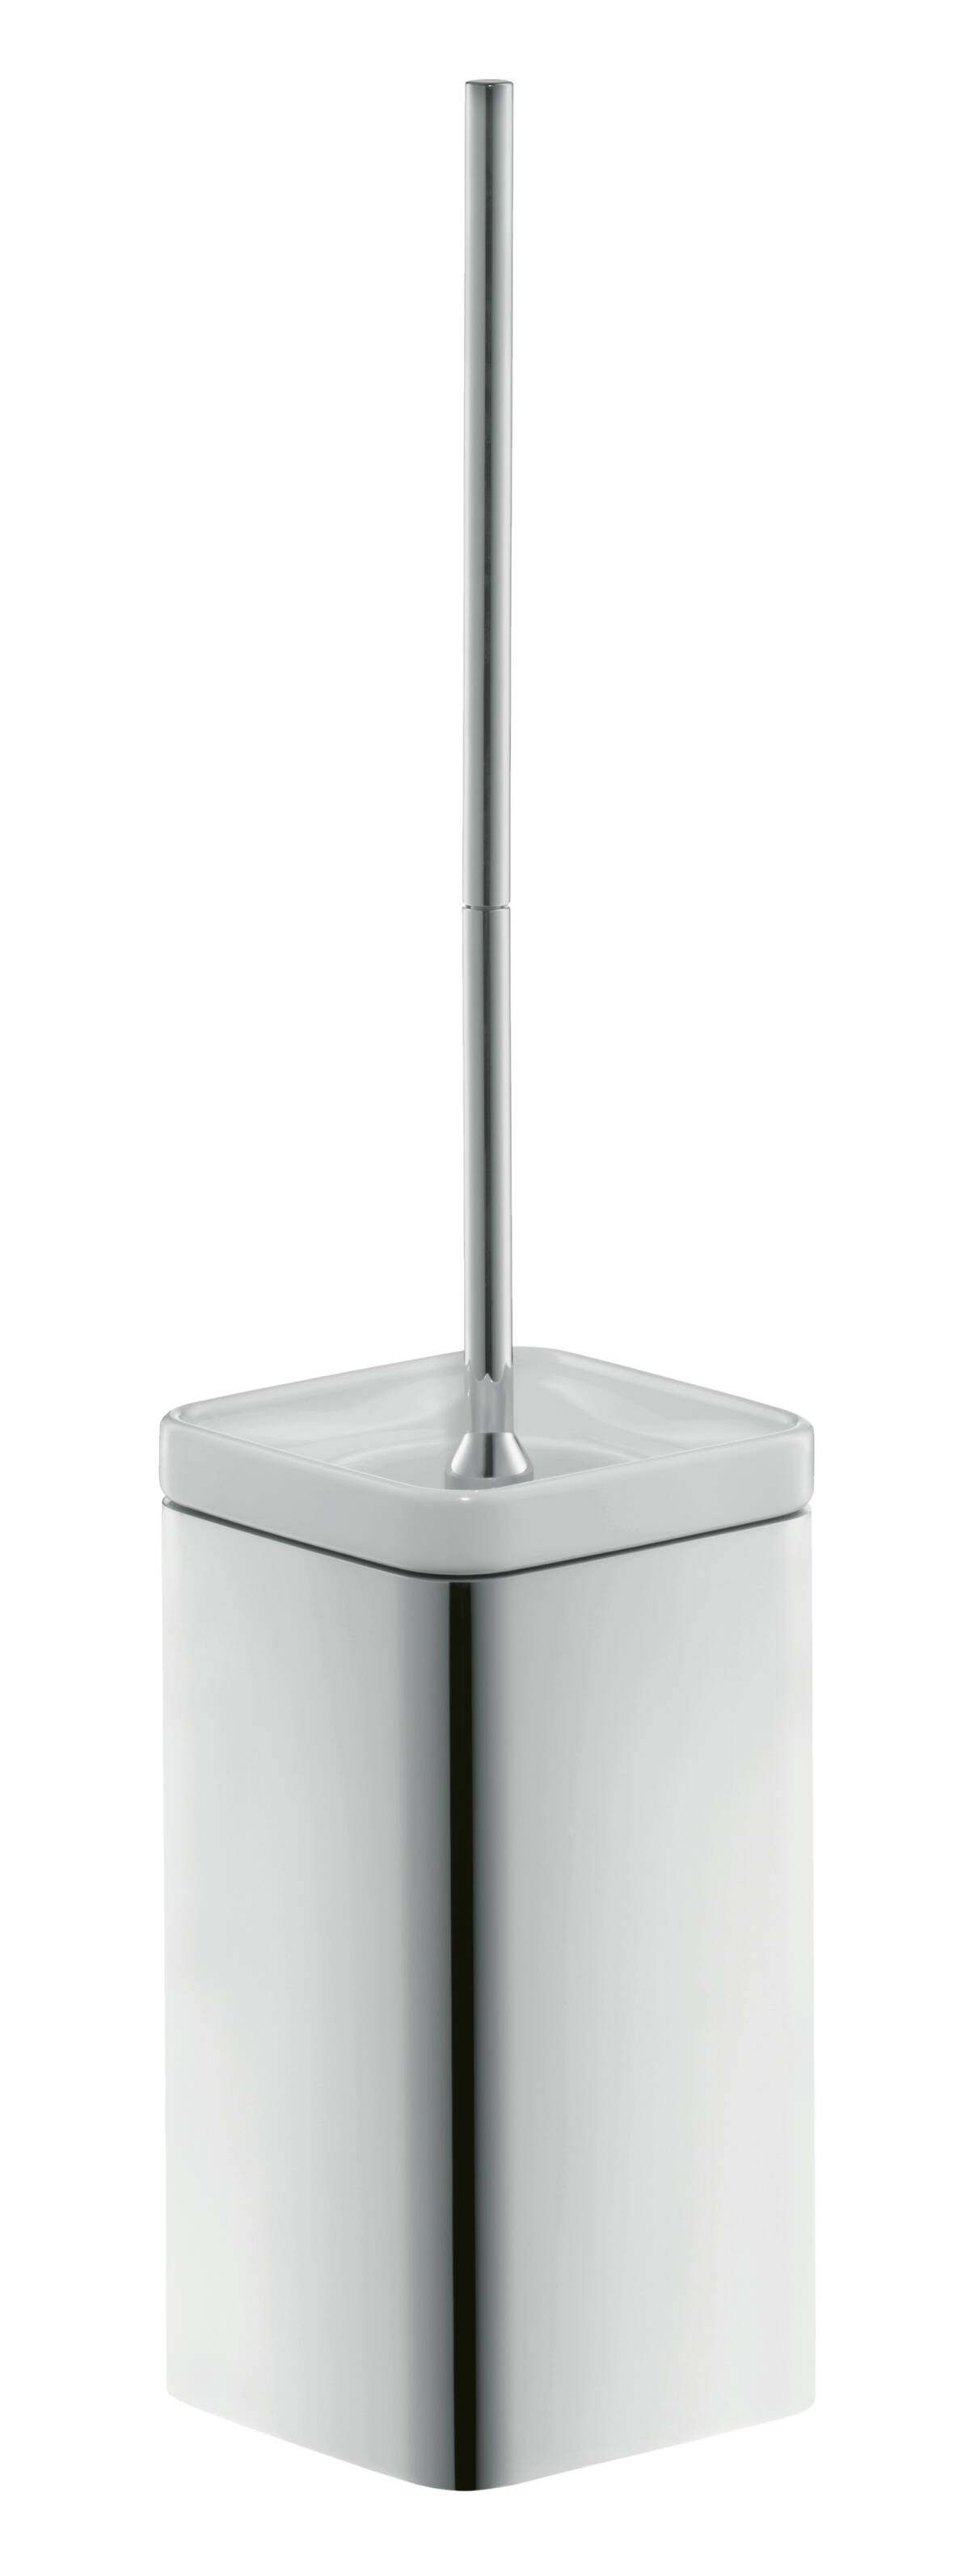 Toilet brush holder wall-mounted, Brushed Bronze, 42435140